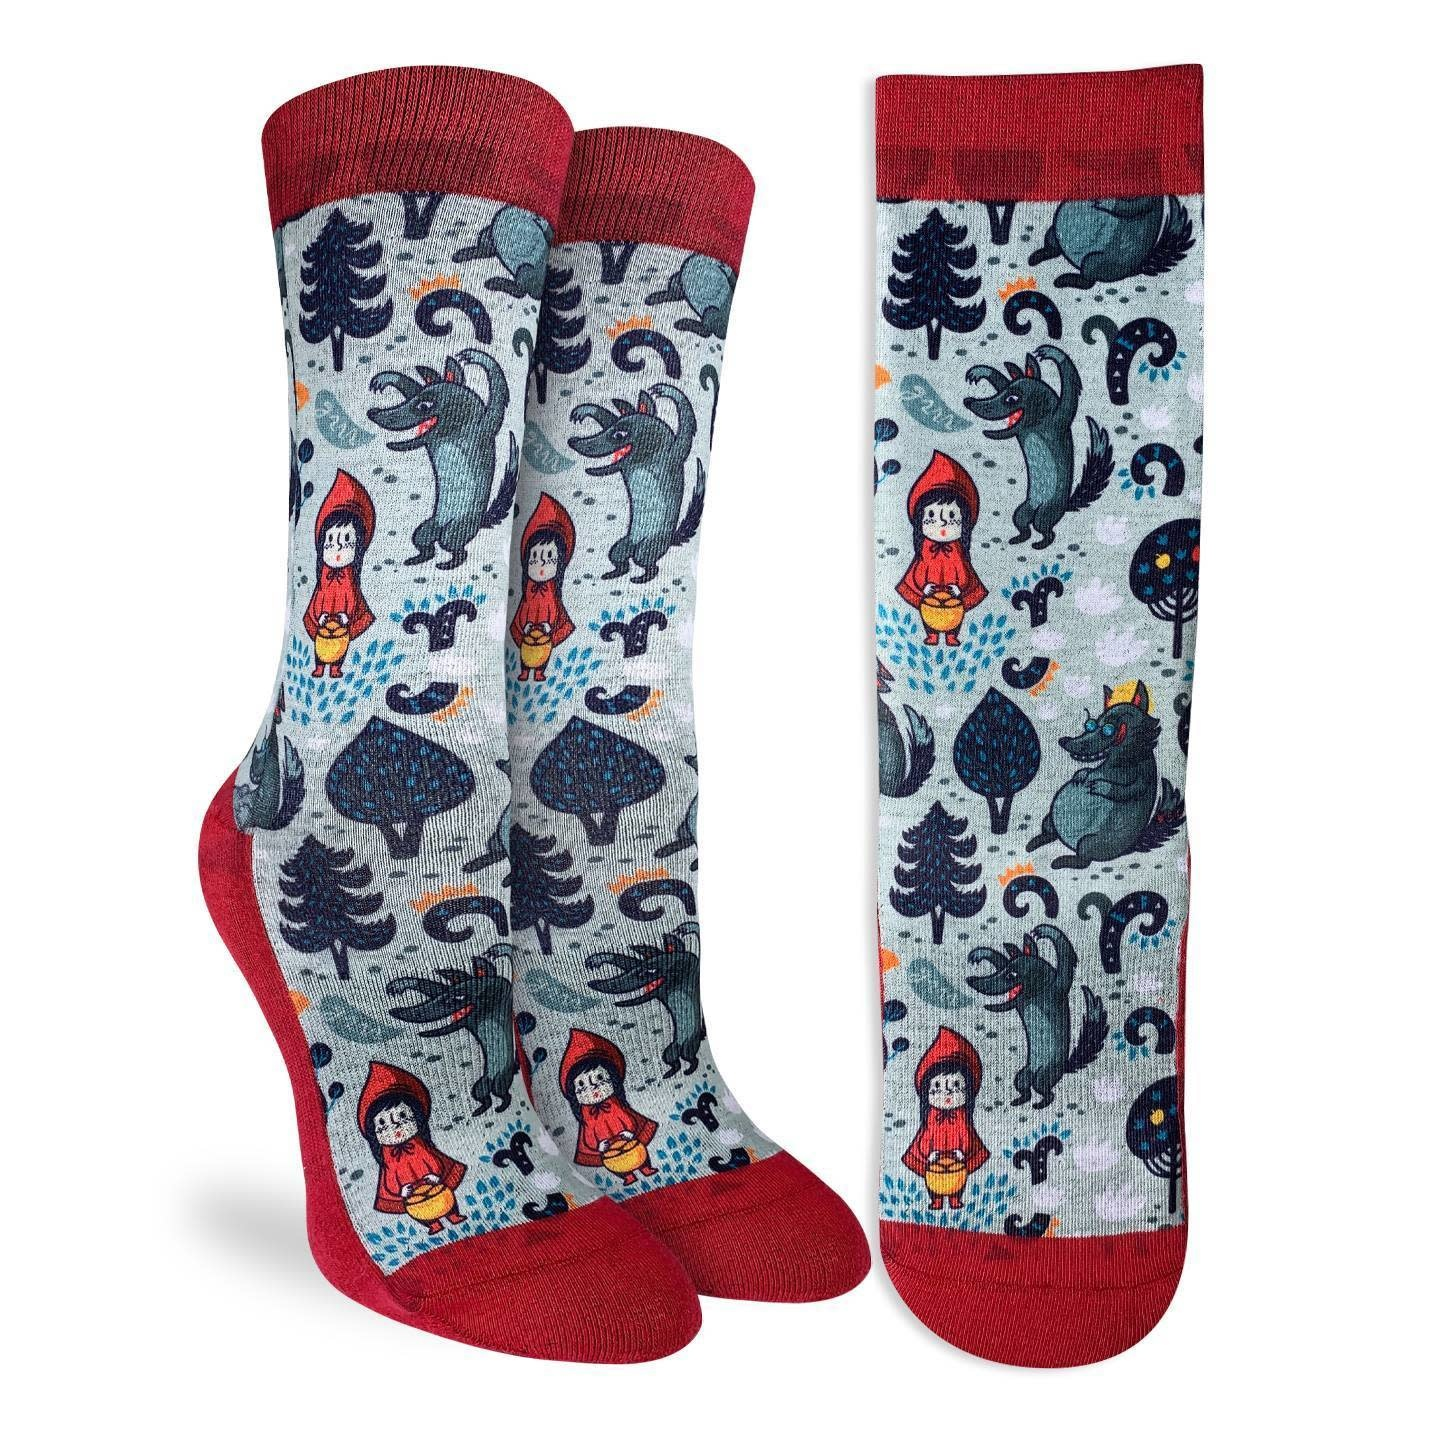 Good Luck Sock Active Fit Socks - SM